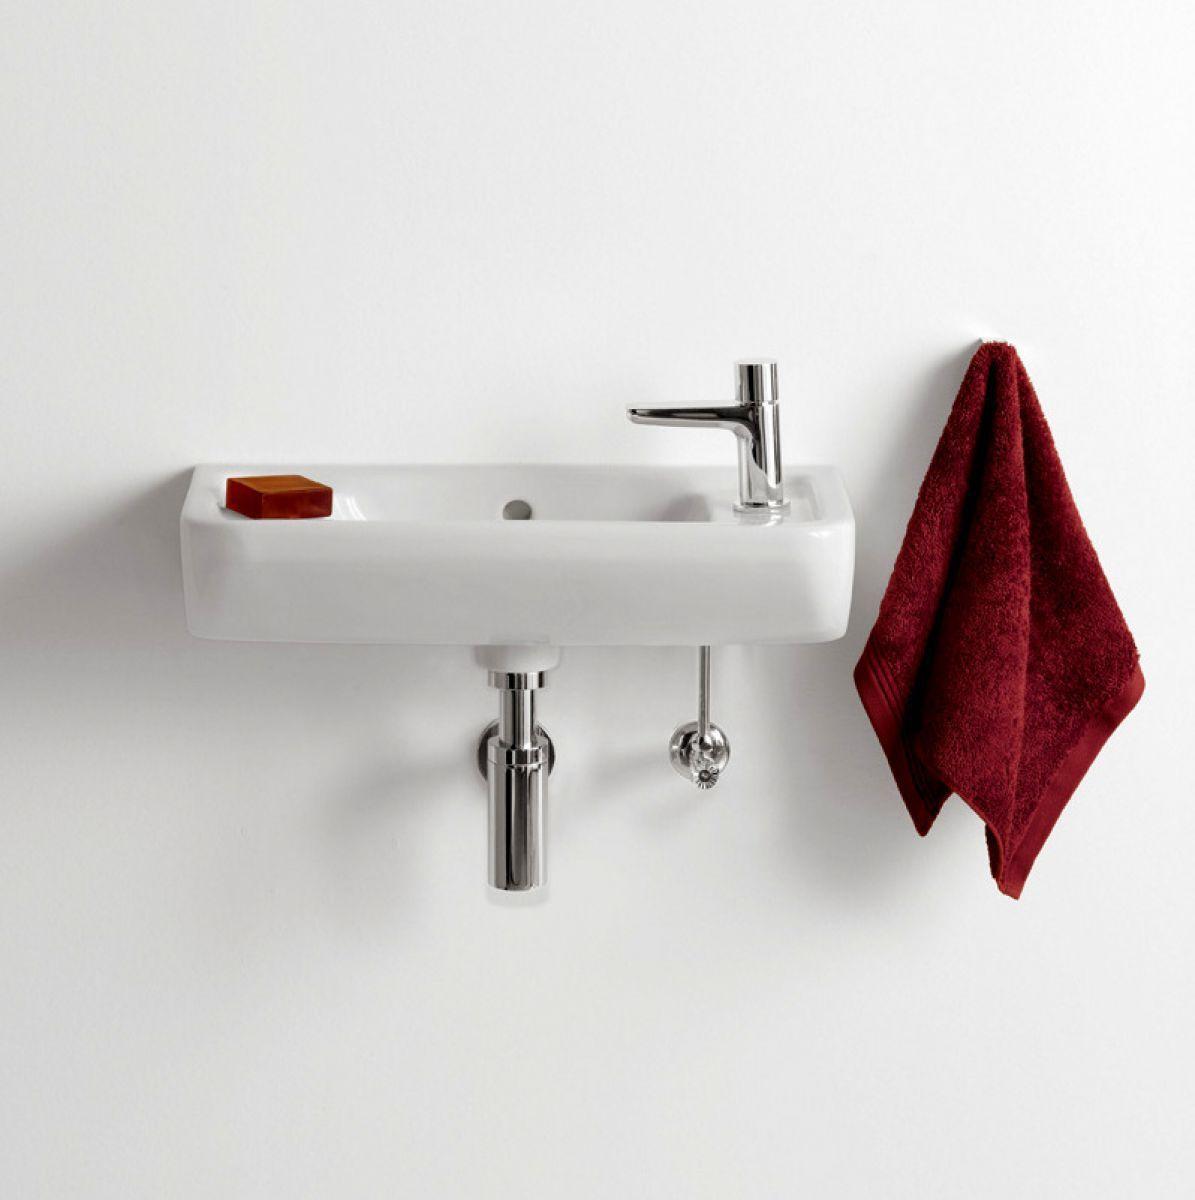 V & B Architectura Small Cloakroom Basin 5373 Cloakroom